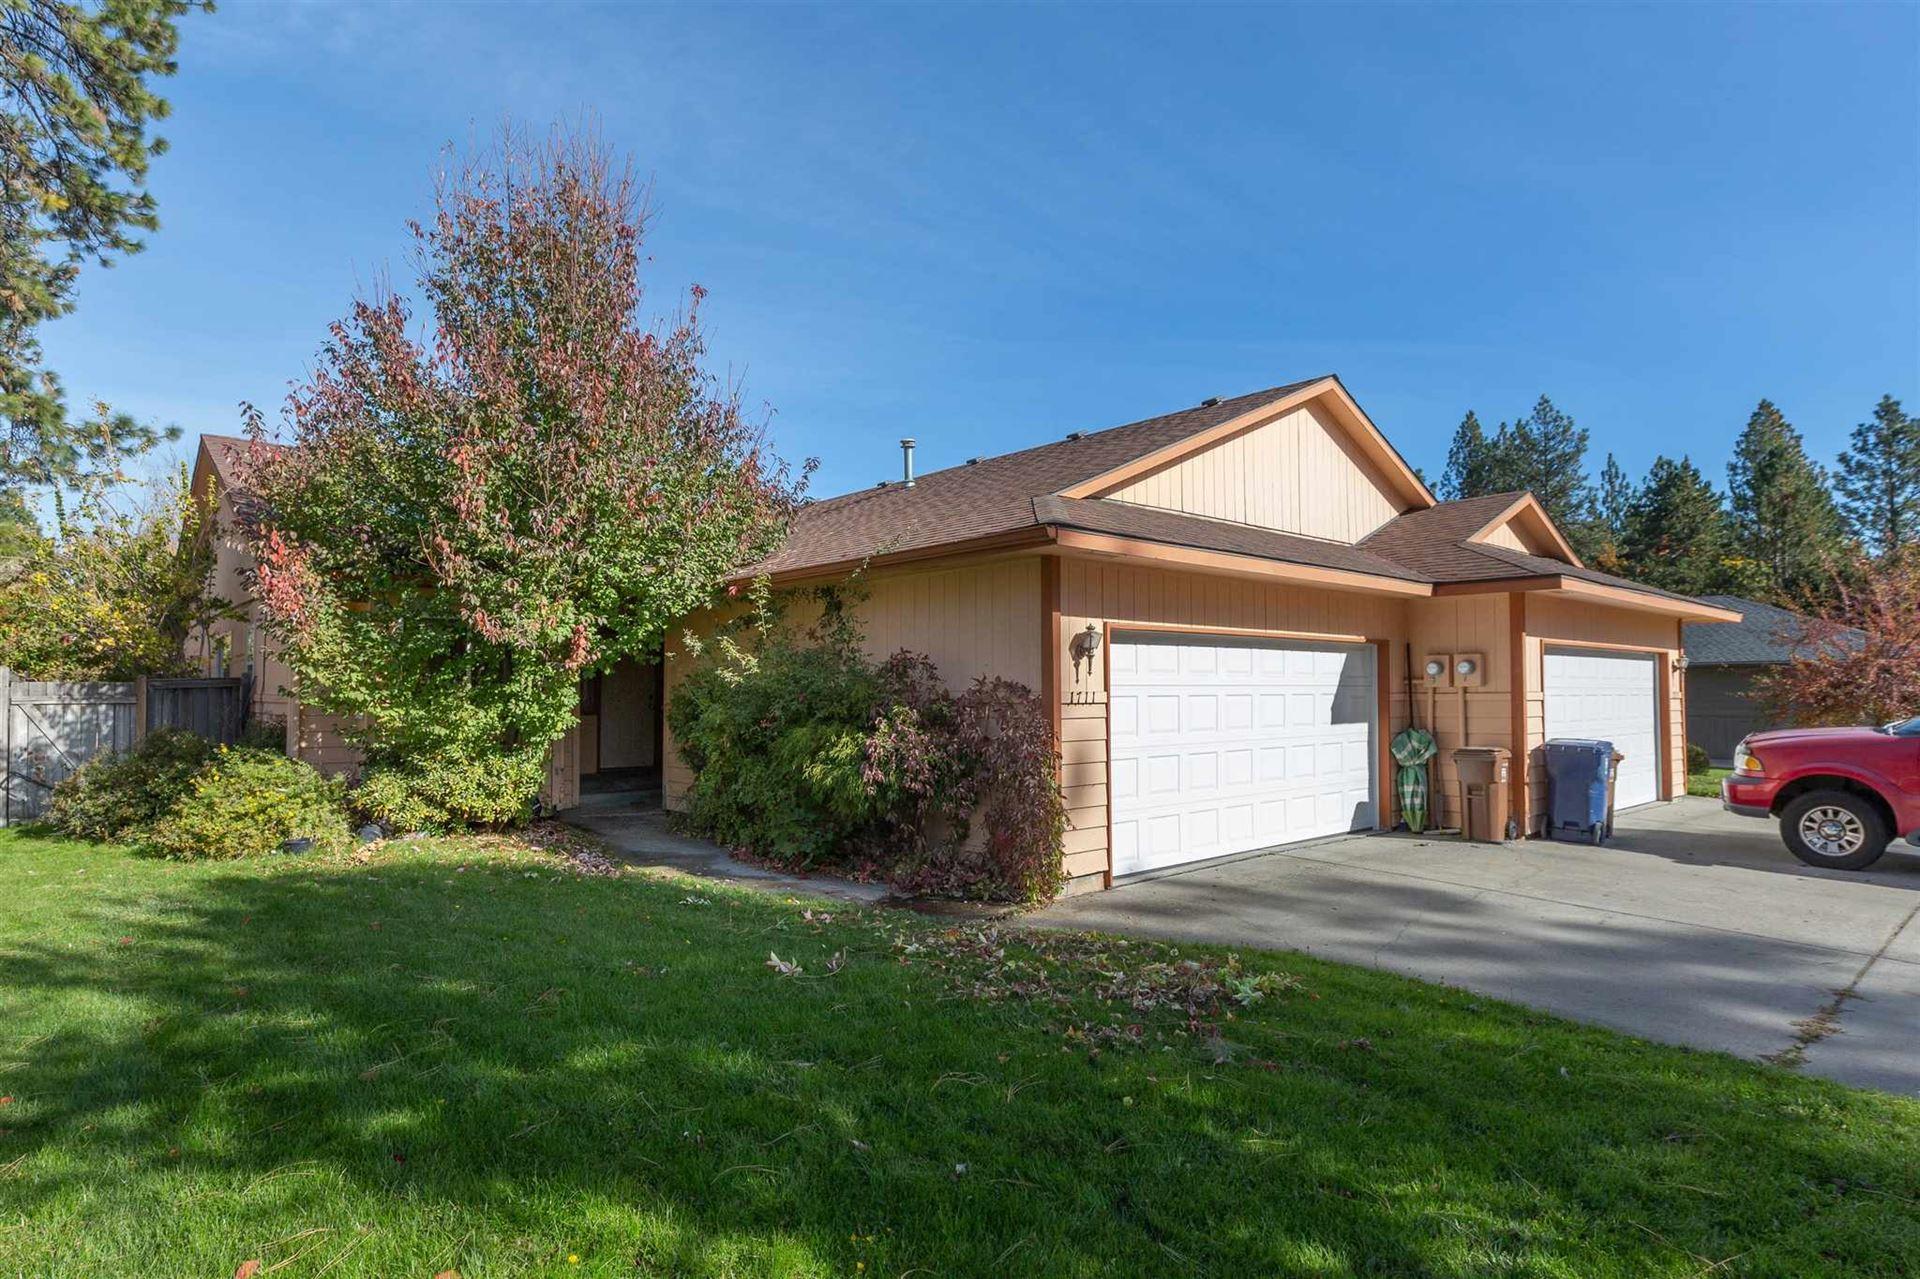 1711 E 33rd Ave #1713 E 33rd Ave, Spokane, WA 99203 - #: 202123936